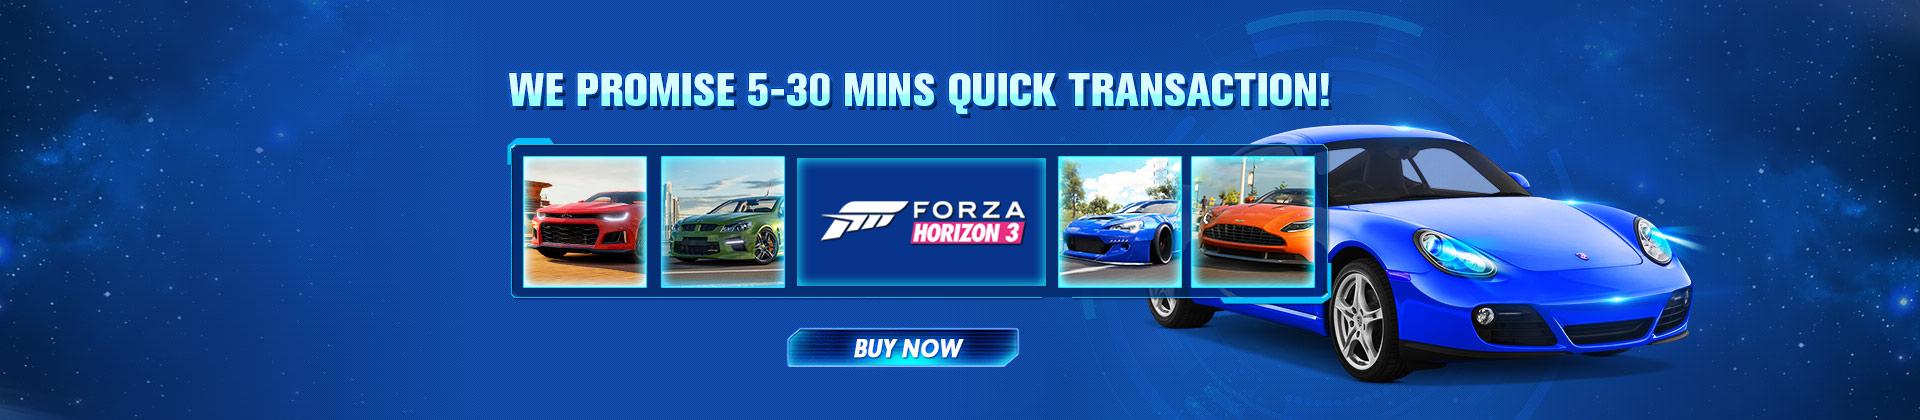 Buy Forza Horizon 3 Credits